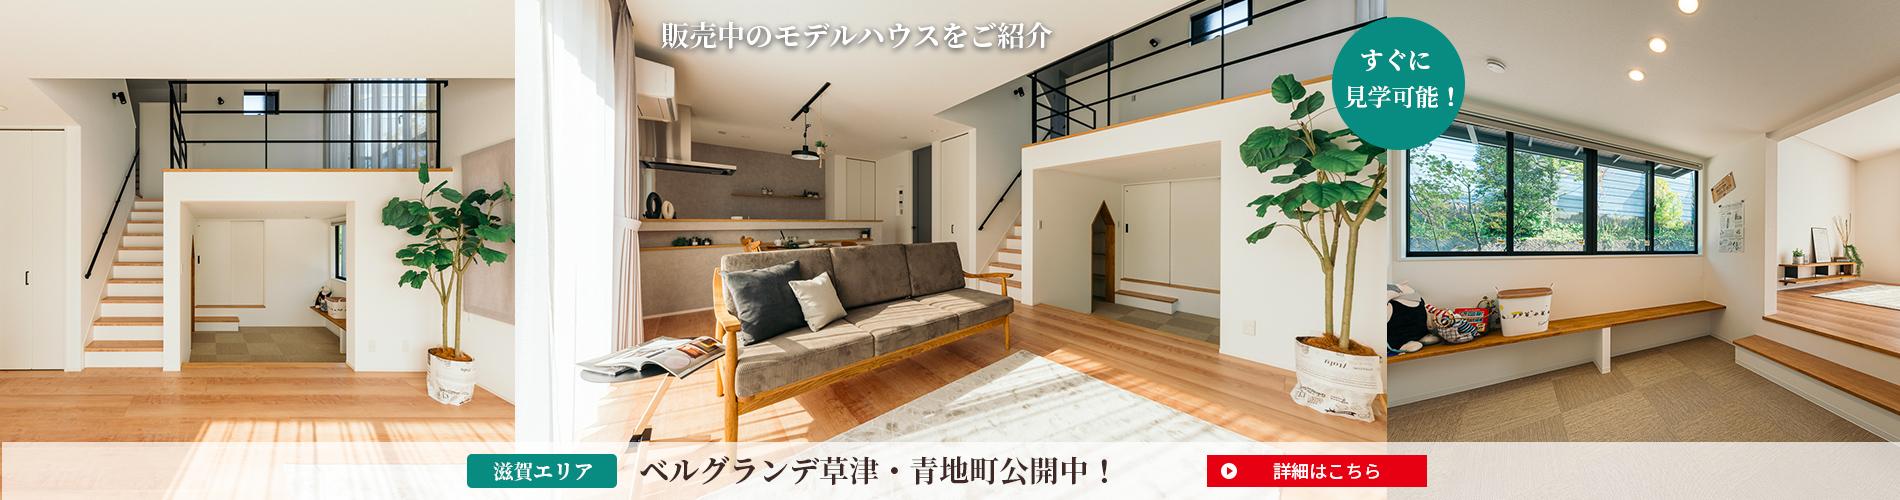 https://www.shikishima-j.co.jp/app-def/S-102/corporate/wp-content/uploads/2020/10/kusatsu_aoji.jpg